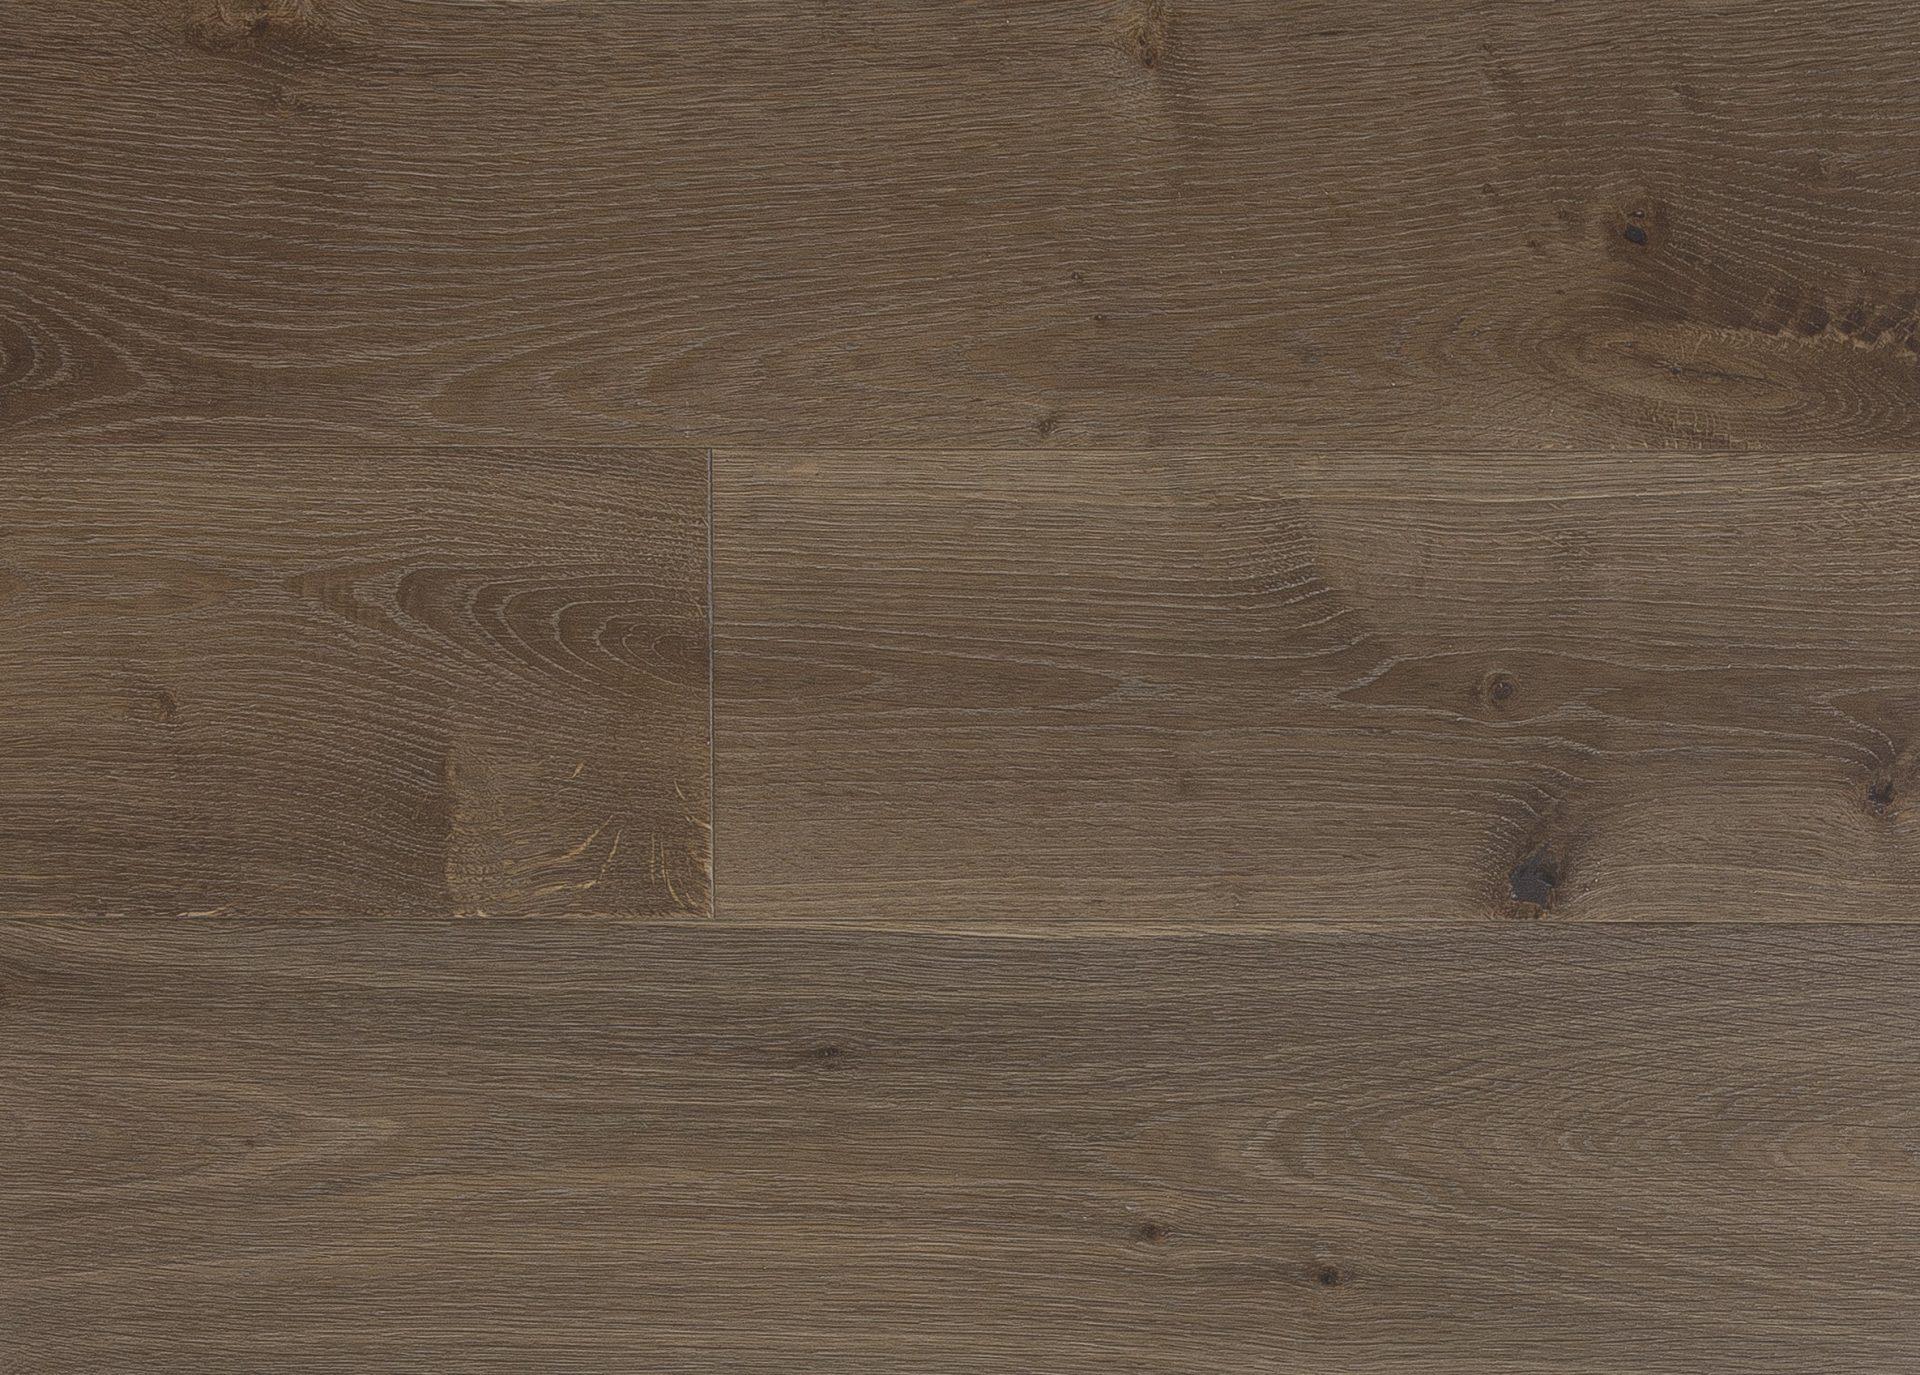 Embelton G5 Luxury Oak 14 5mm Geelong Floors